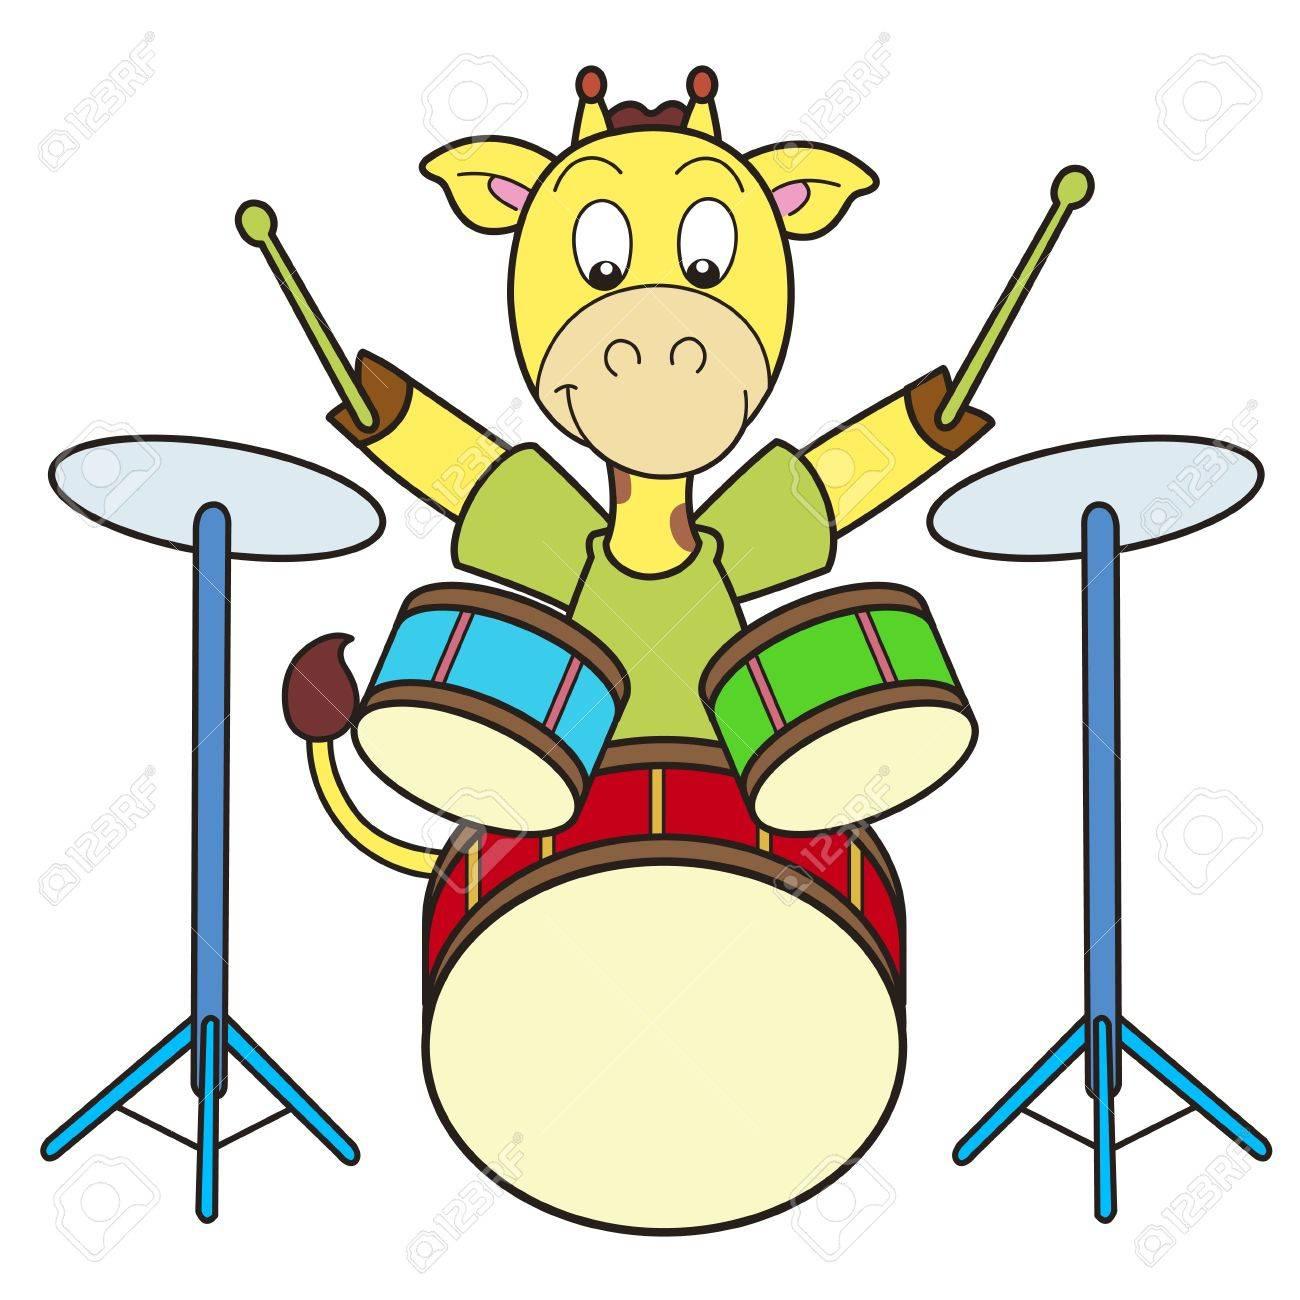 Cartoon giraffe playing drums Stock Vector - 18376428